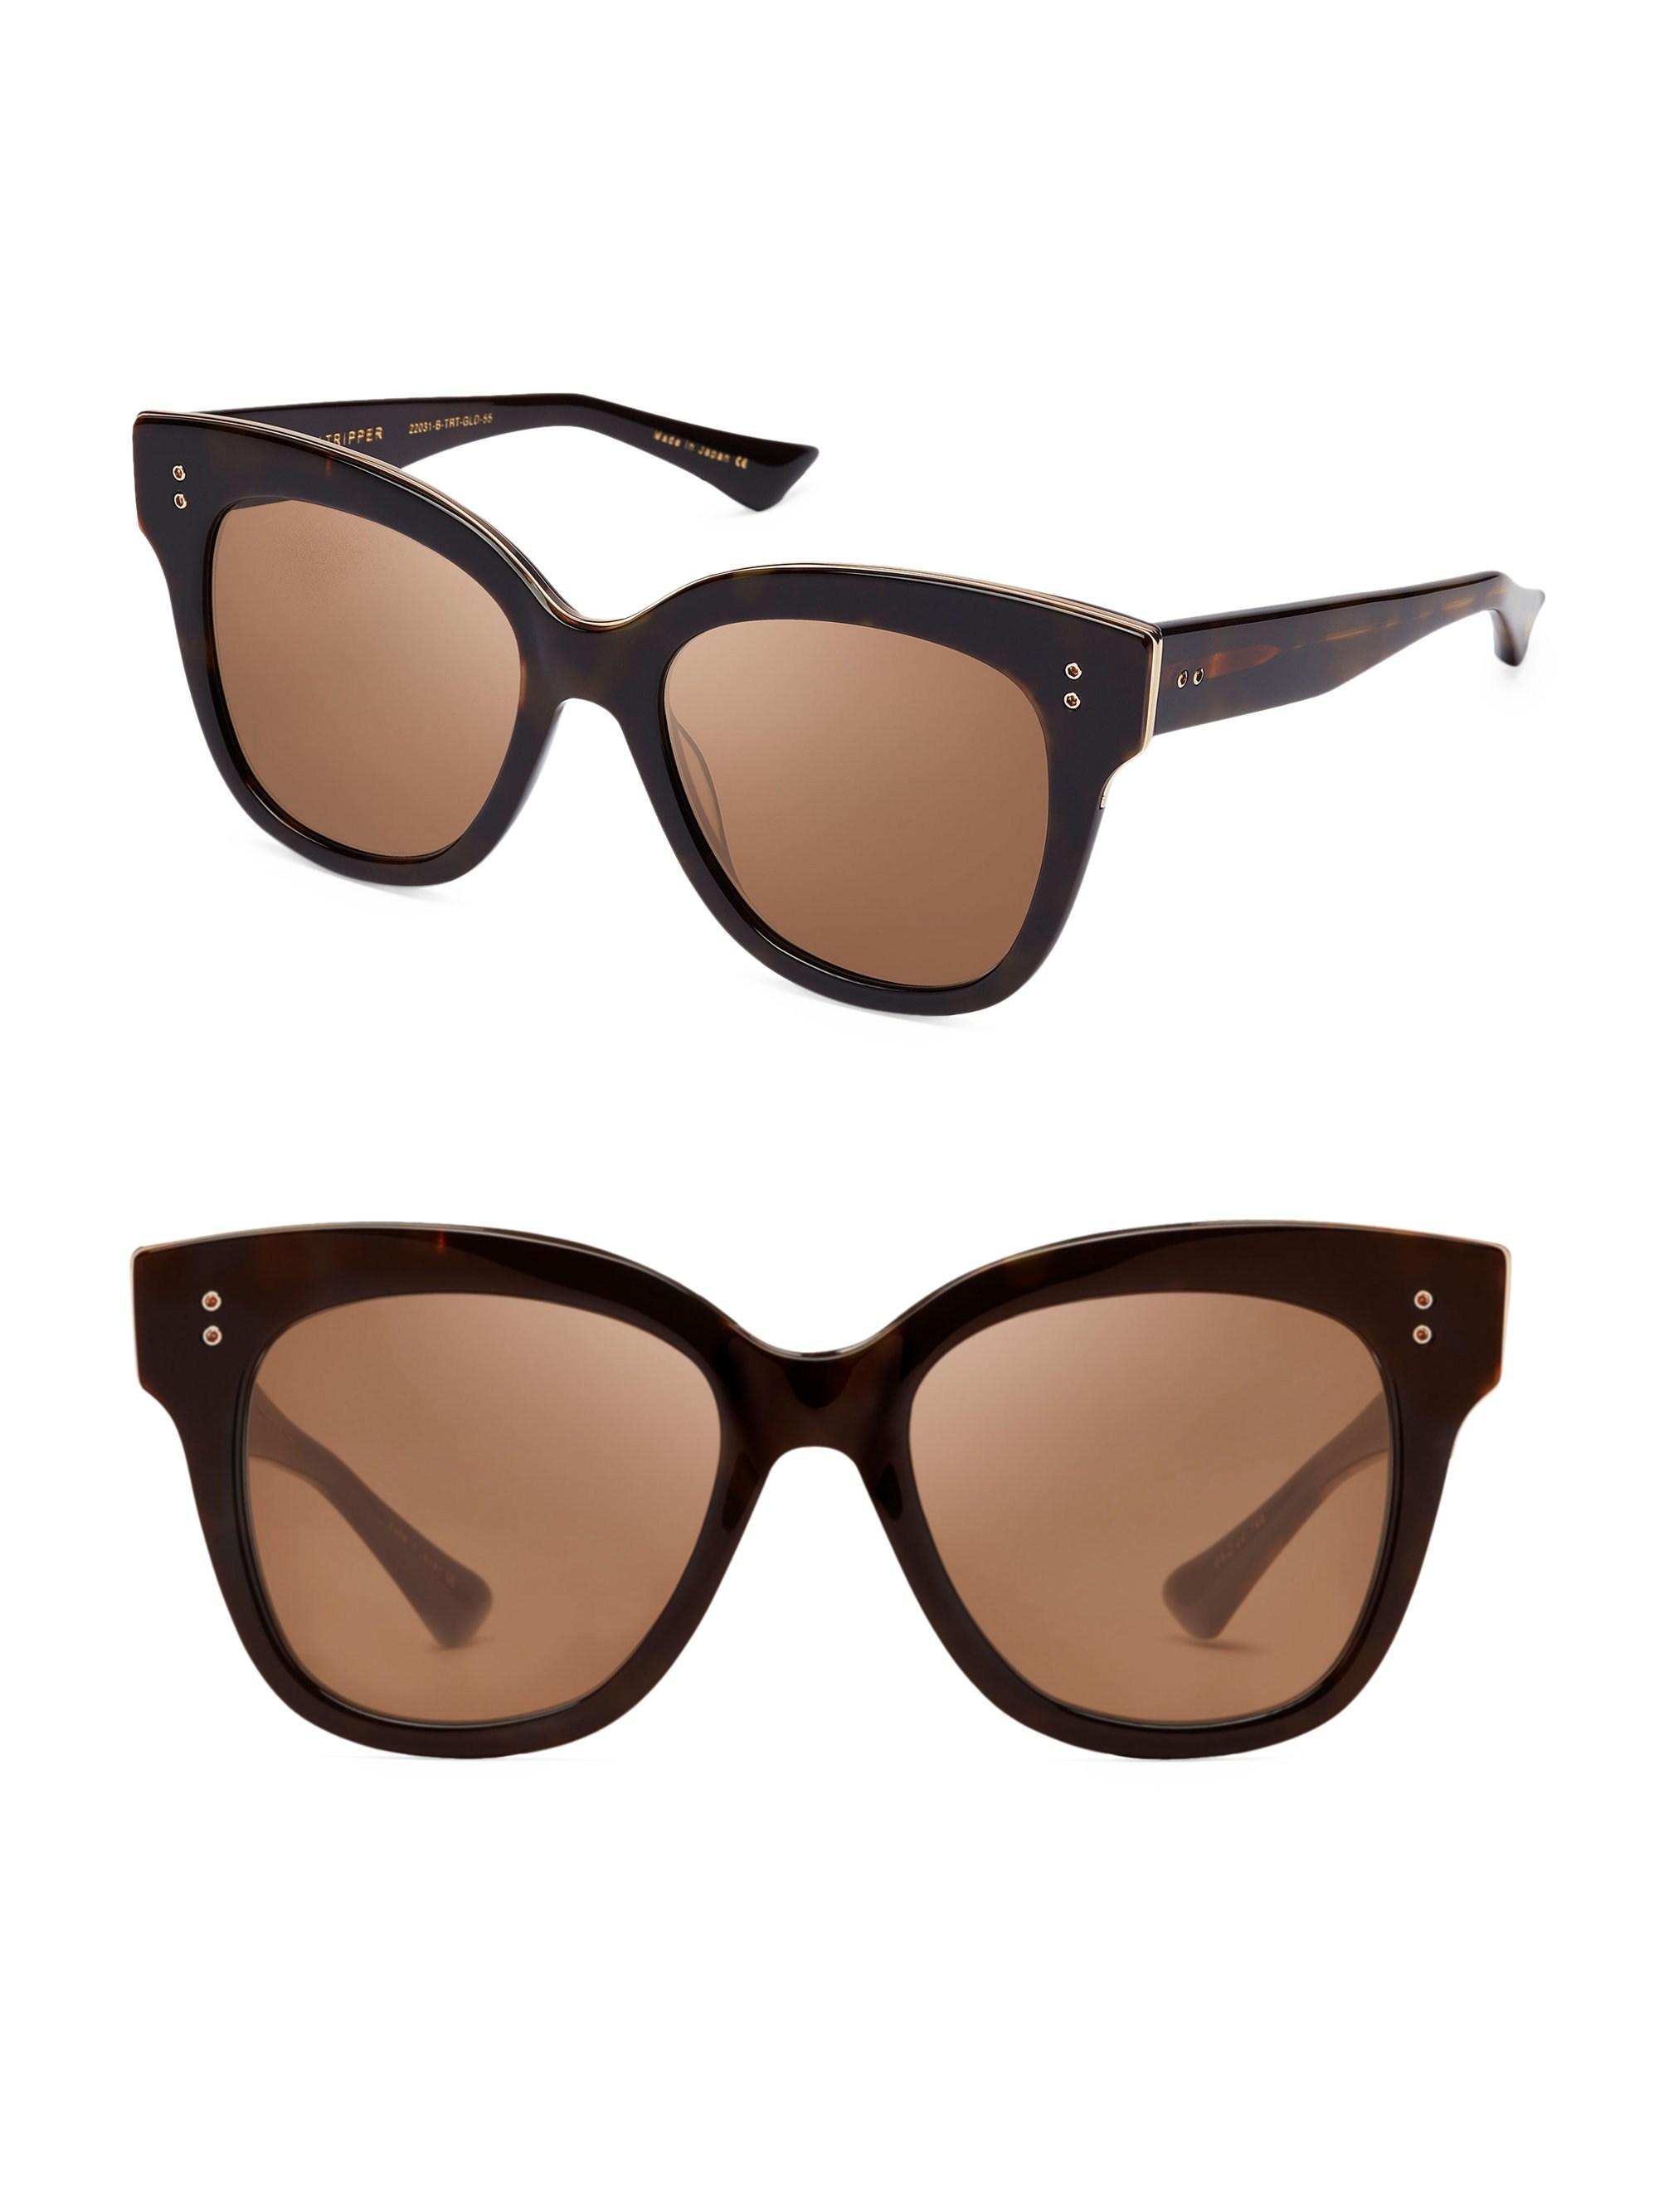 DITA Daytrip Womens Wayfarer Sunglasses in Tortoise